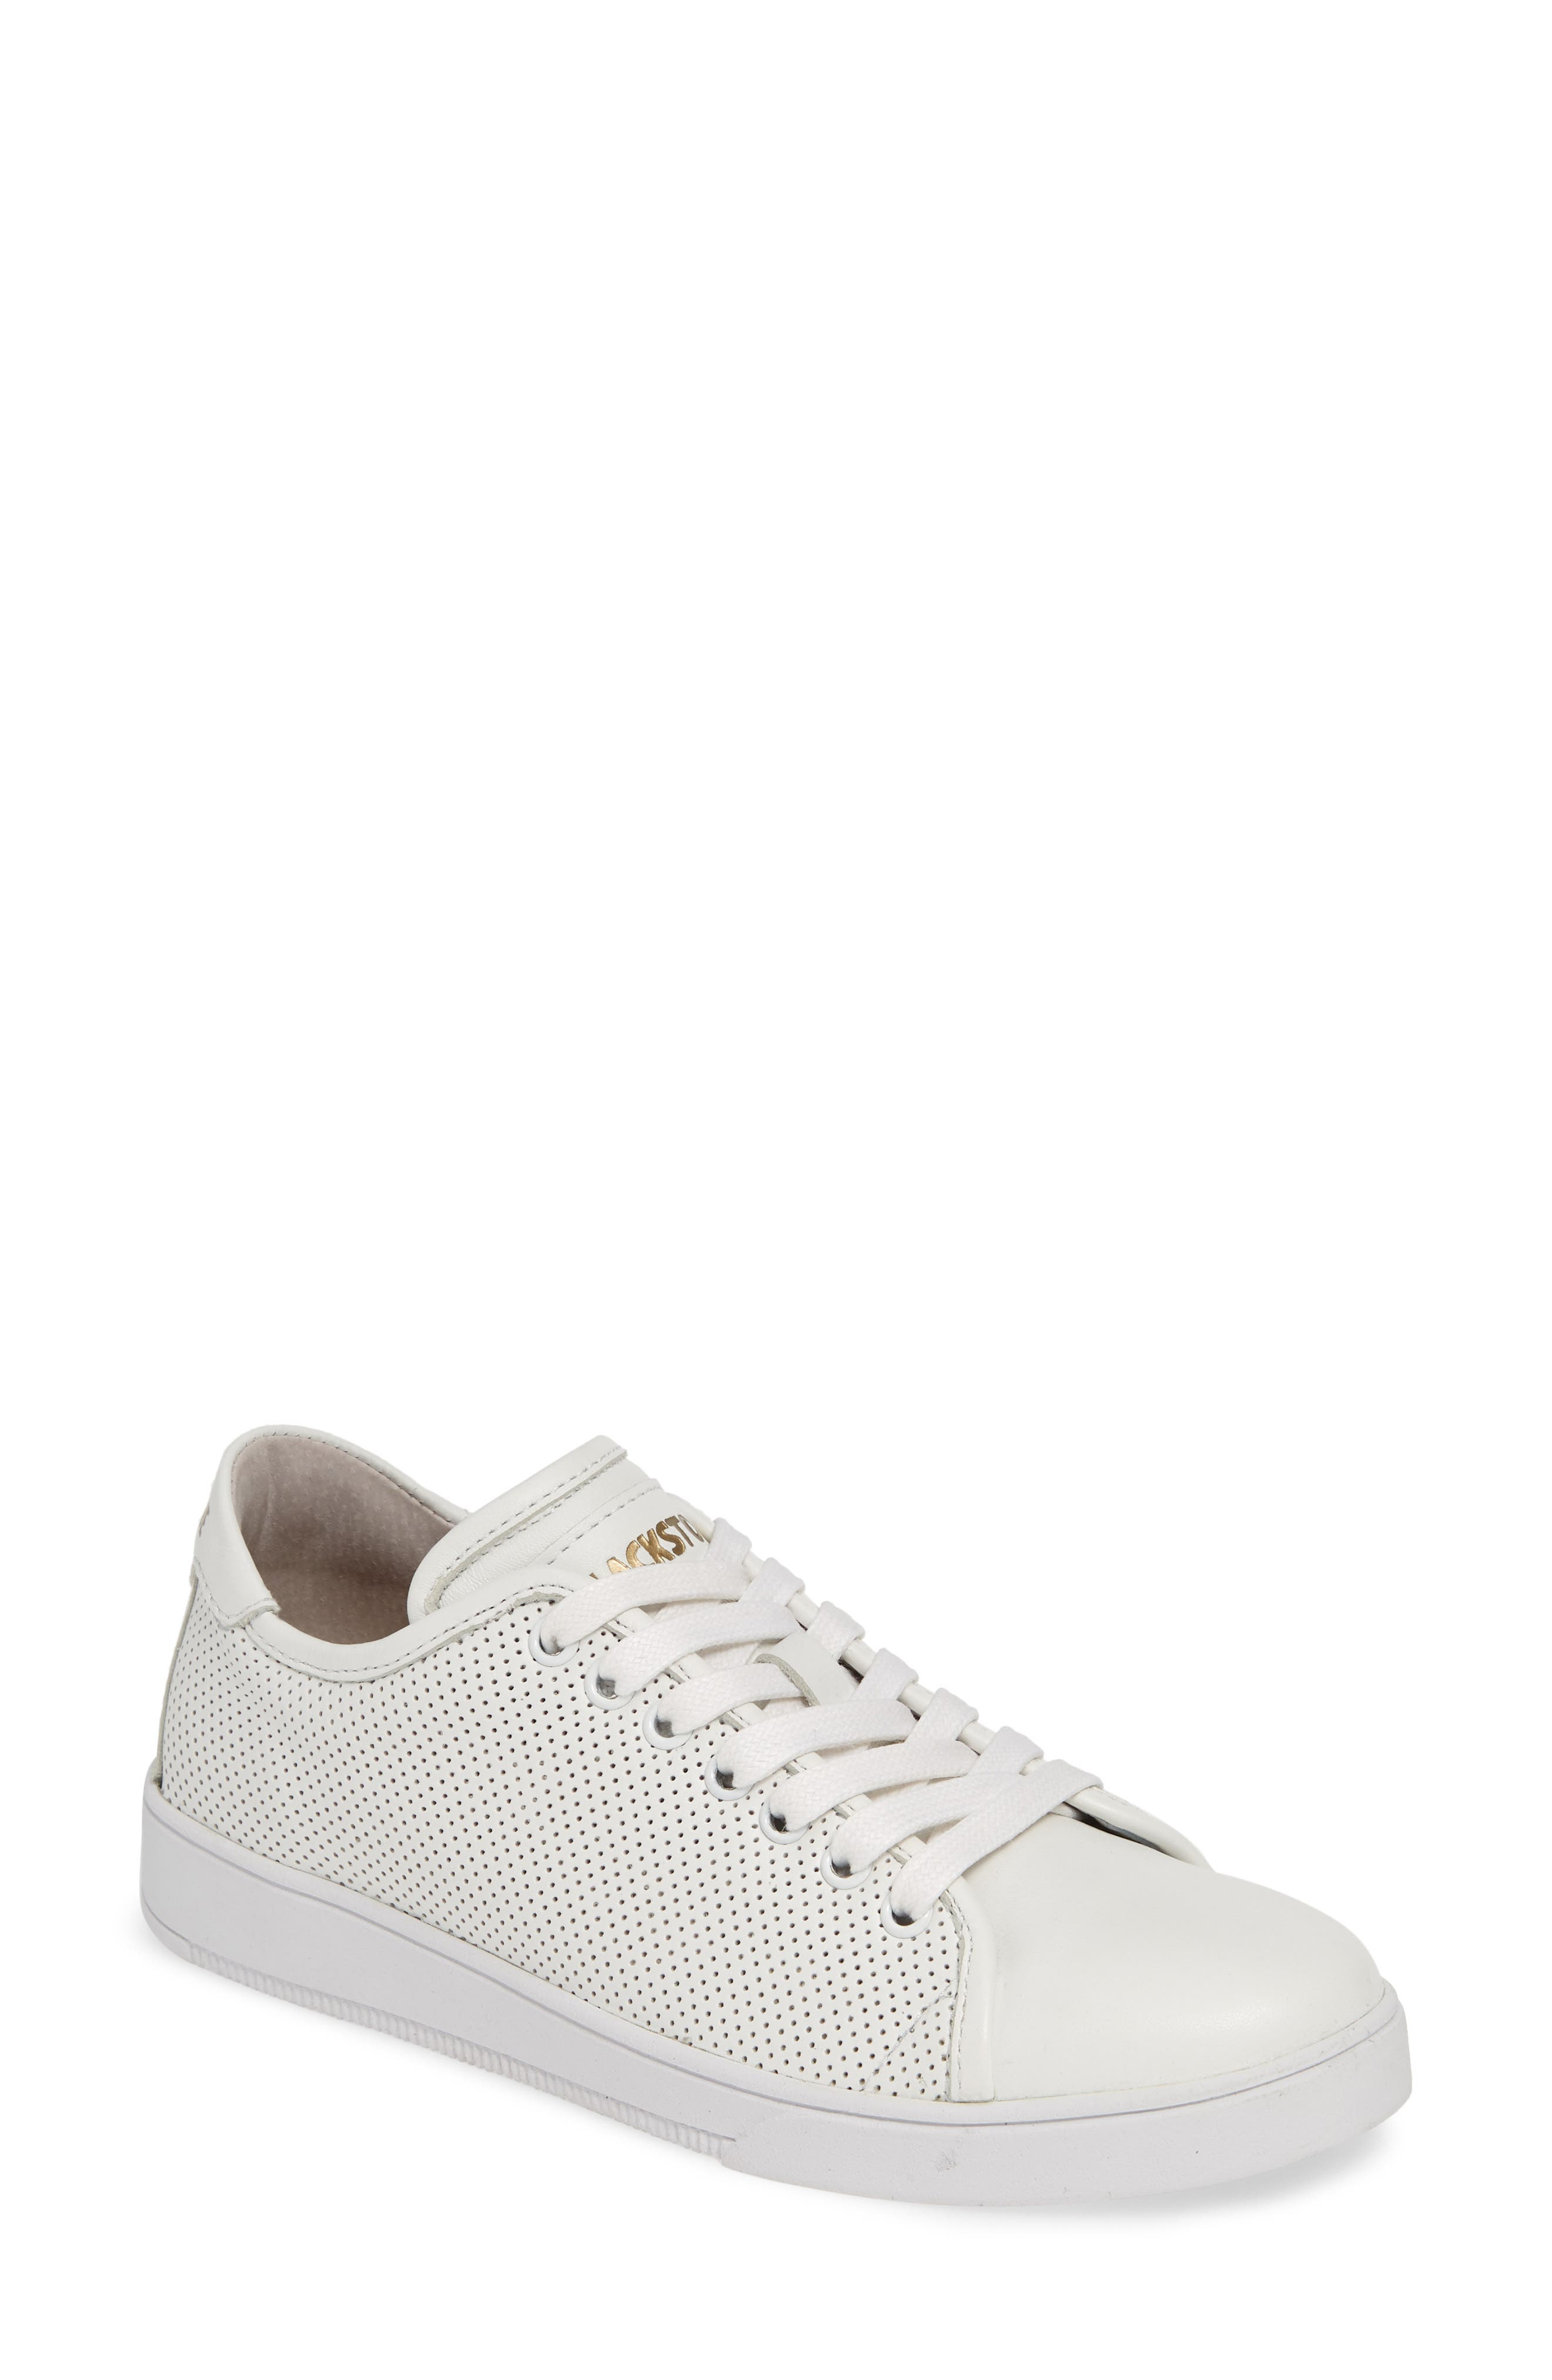 Blackstone Rl72 Perforated Low Top Sneaker, Ivory